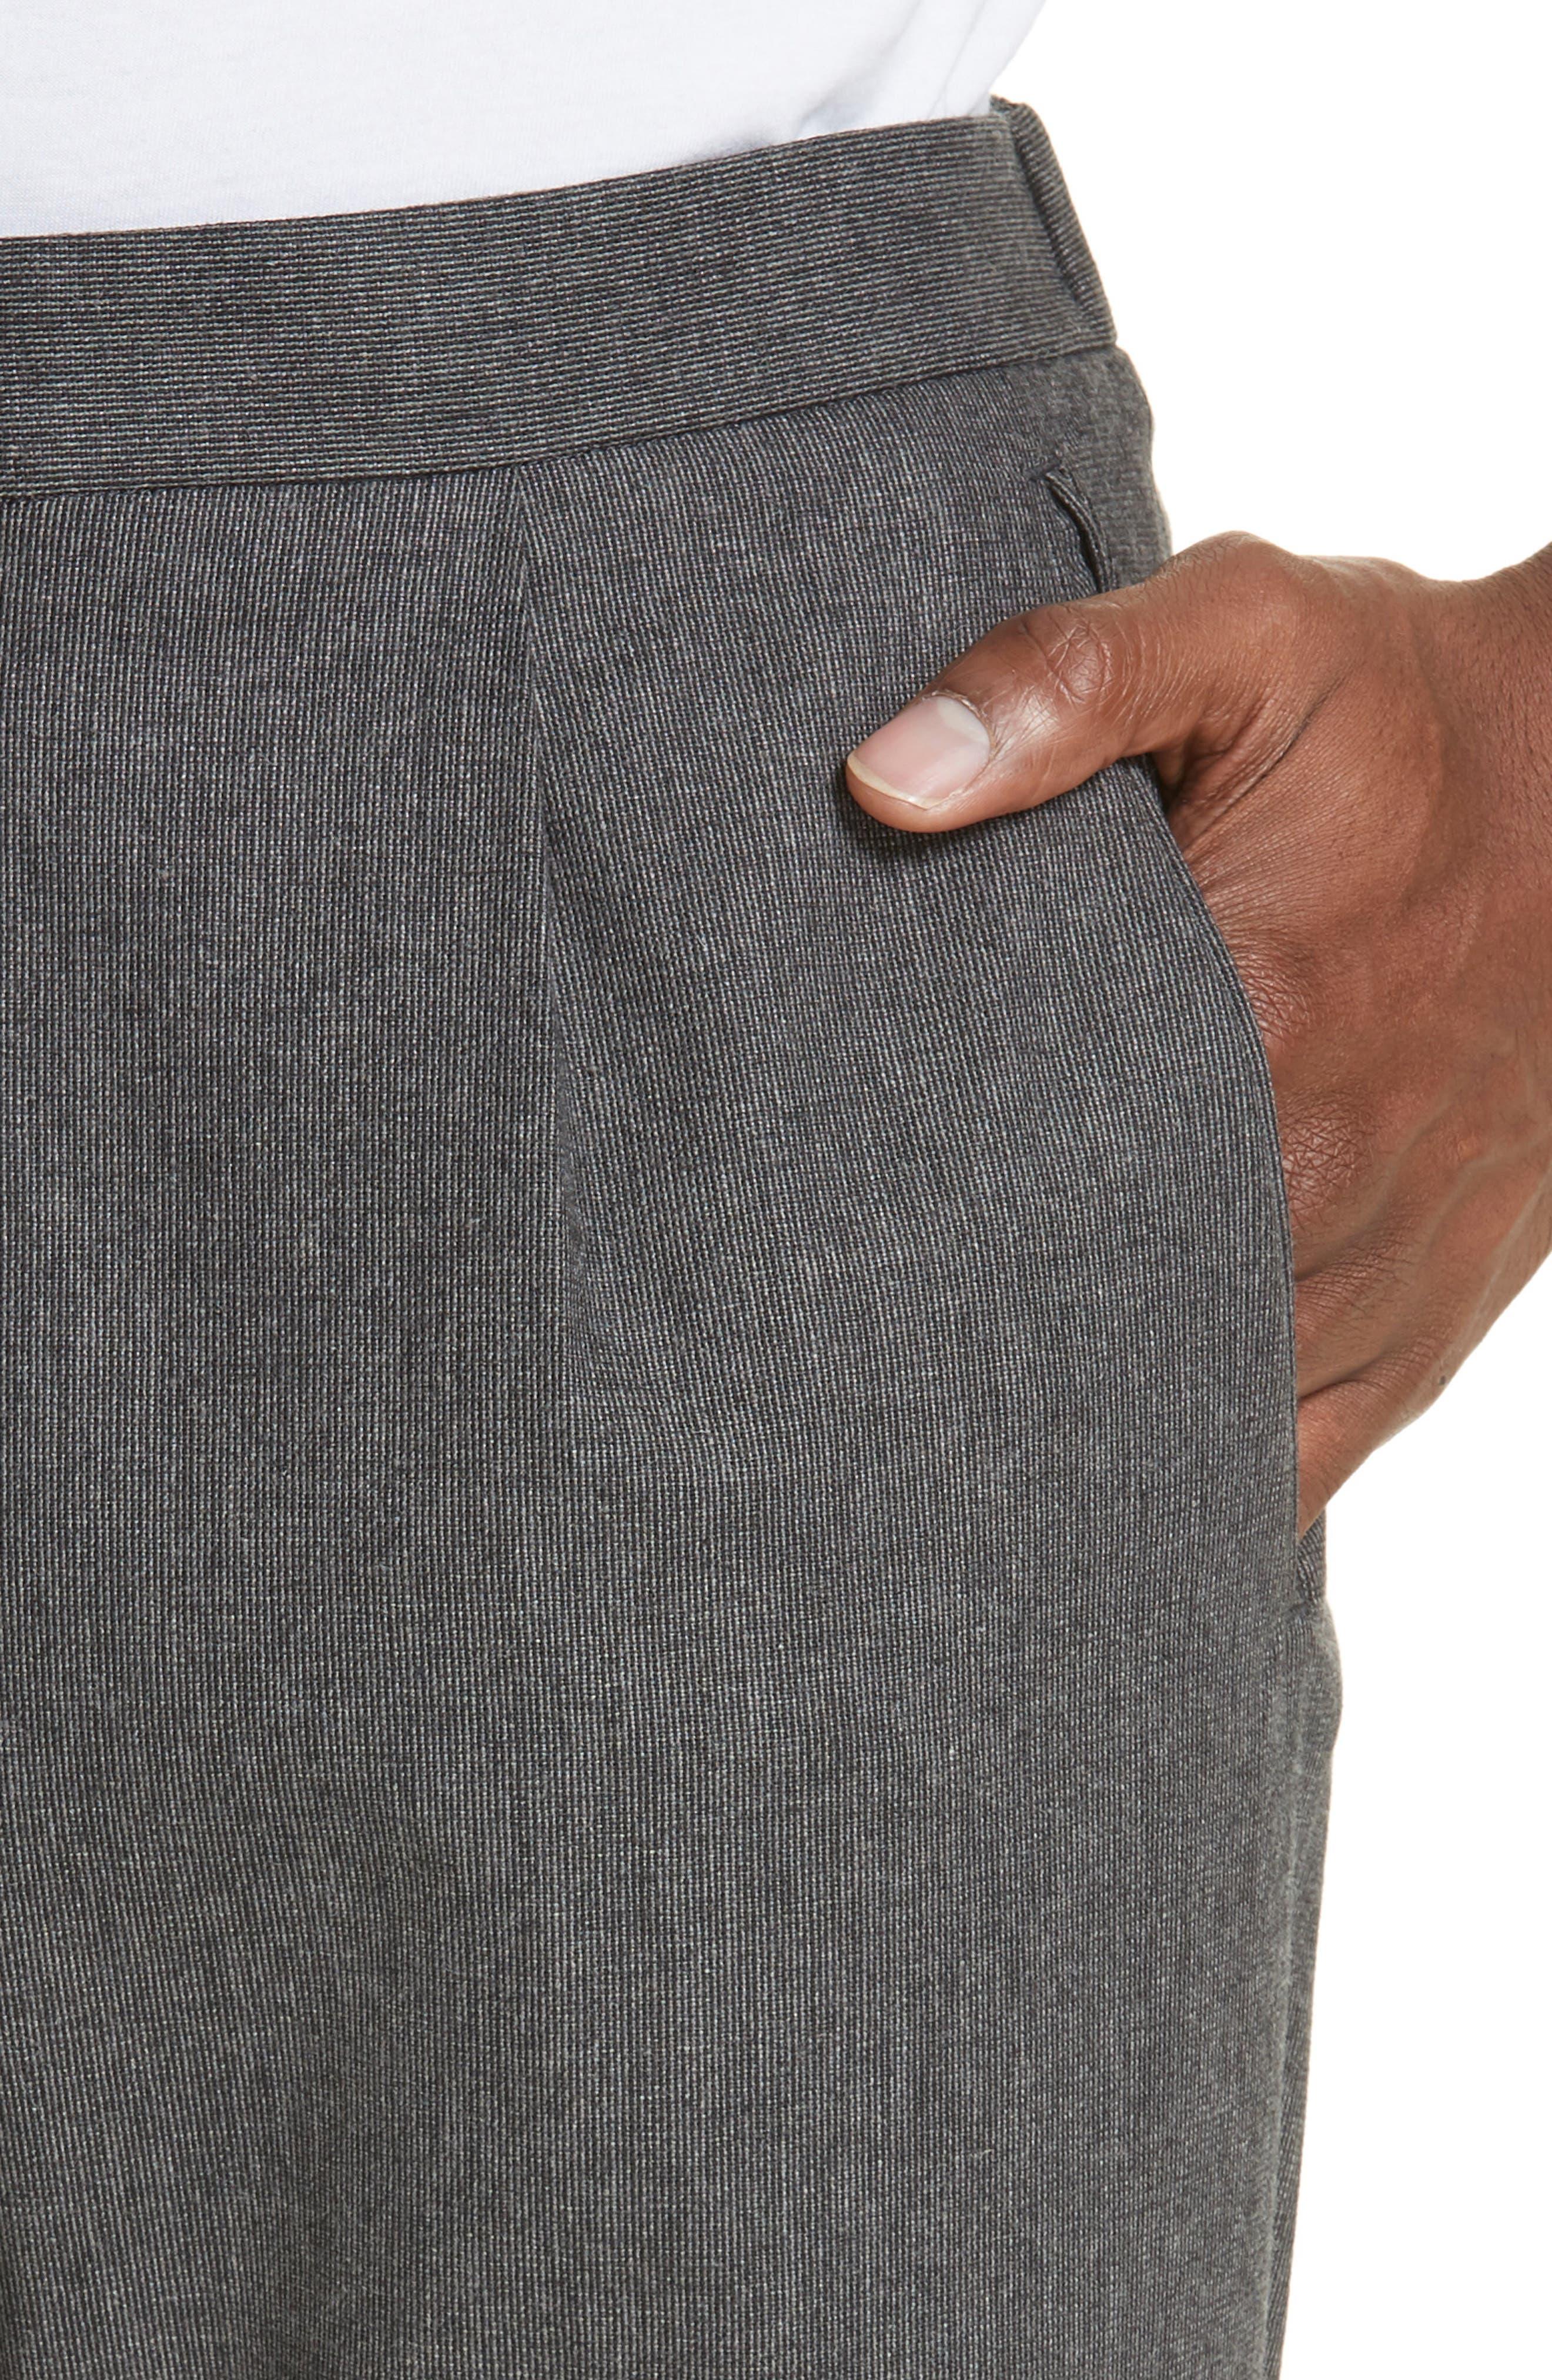 Trim Fit Sport Trousers,                             Alternate thumbnail 4, color,                             CHARCOAL